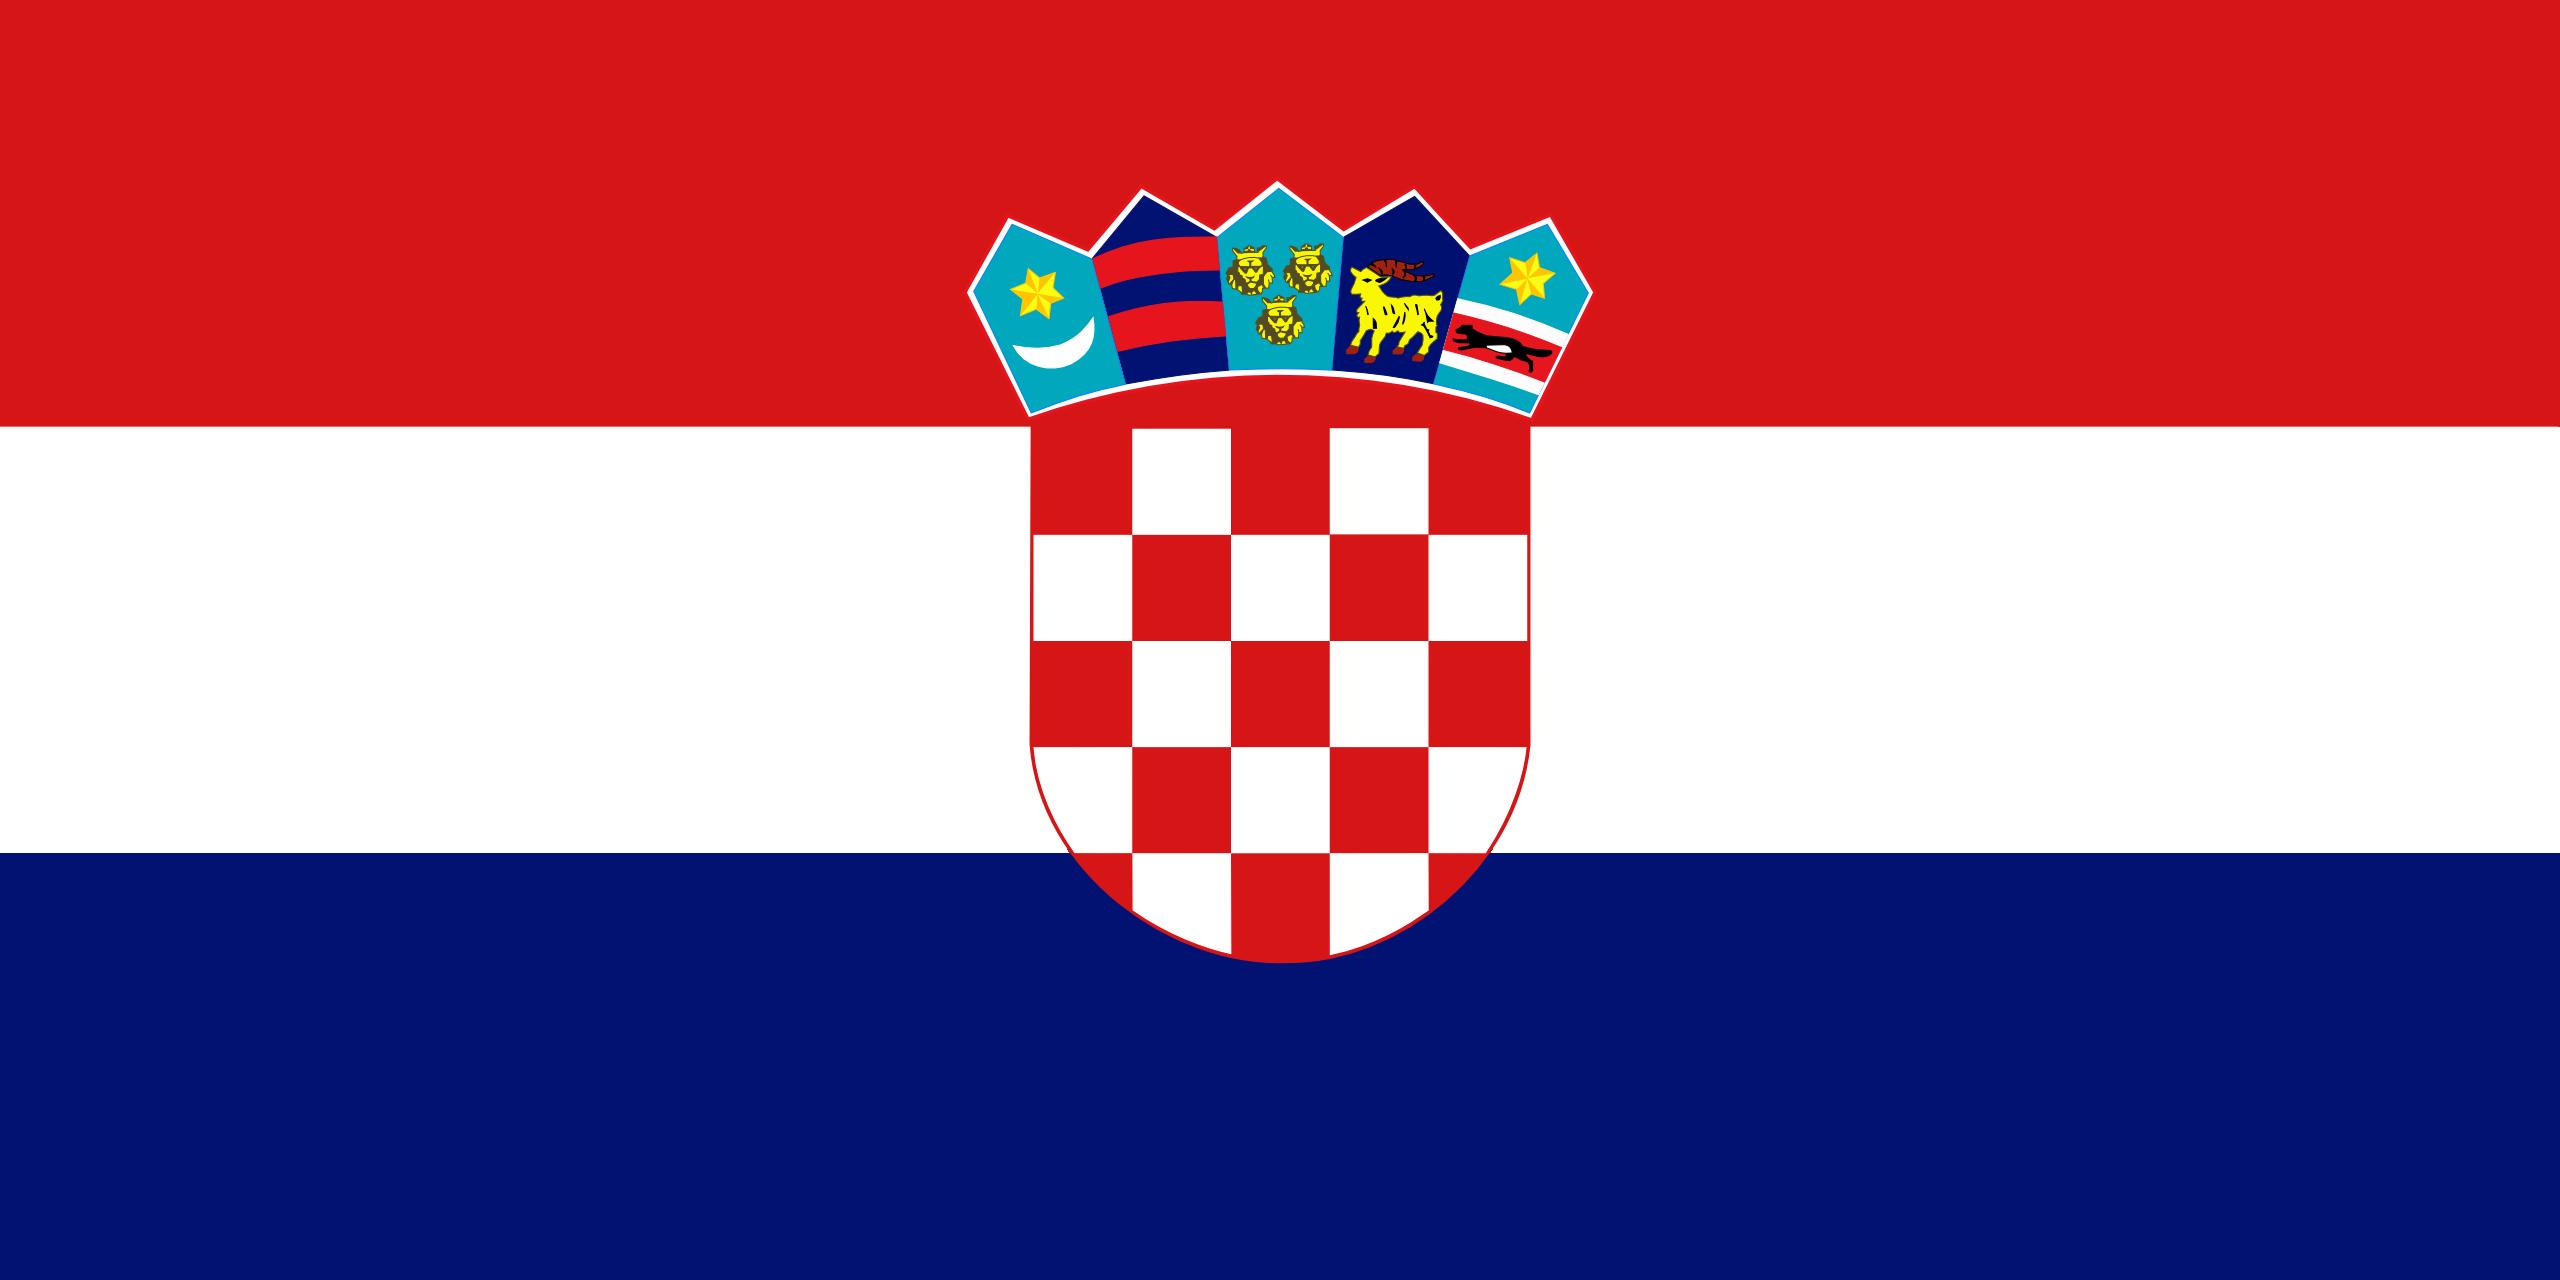 croacia, страна, Эмблема, логотип, символ - Обои HD - Профессор falken.com